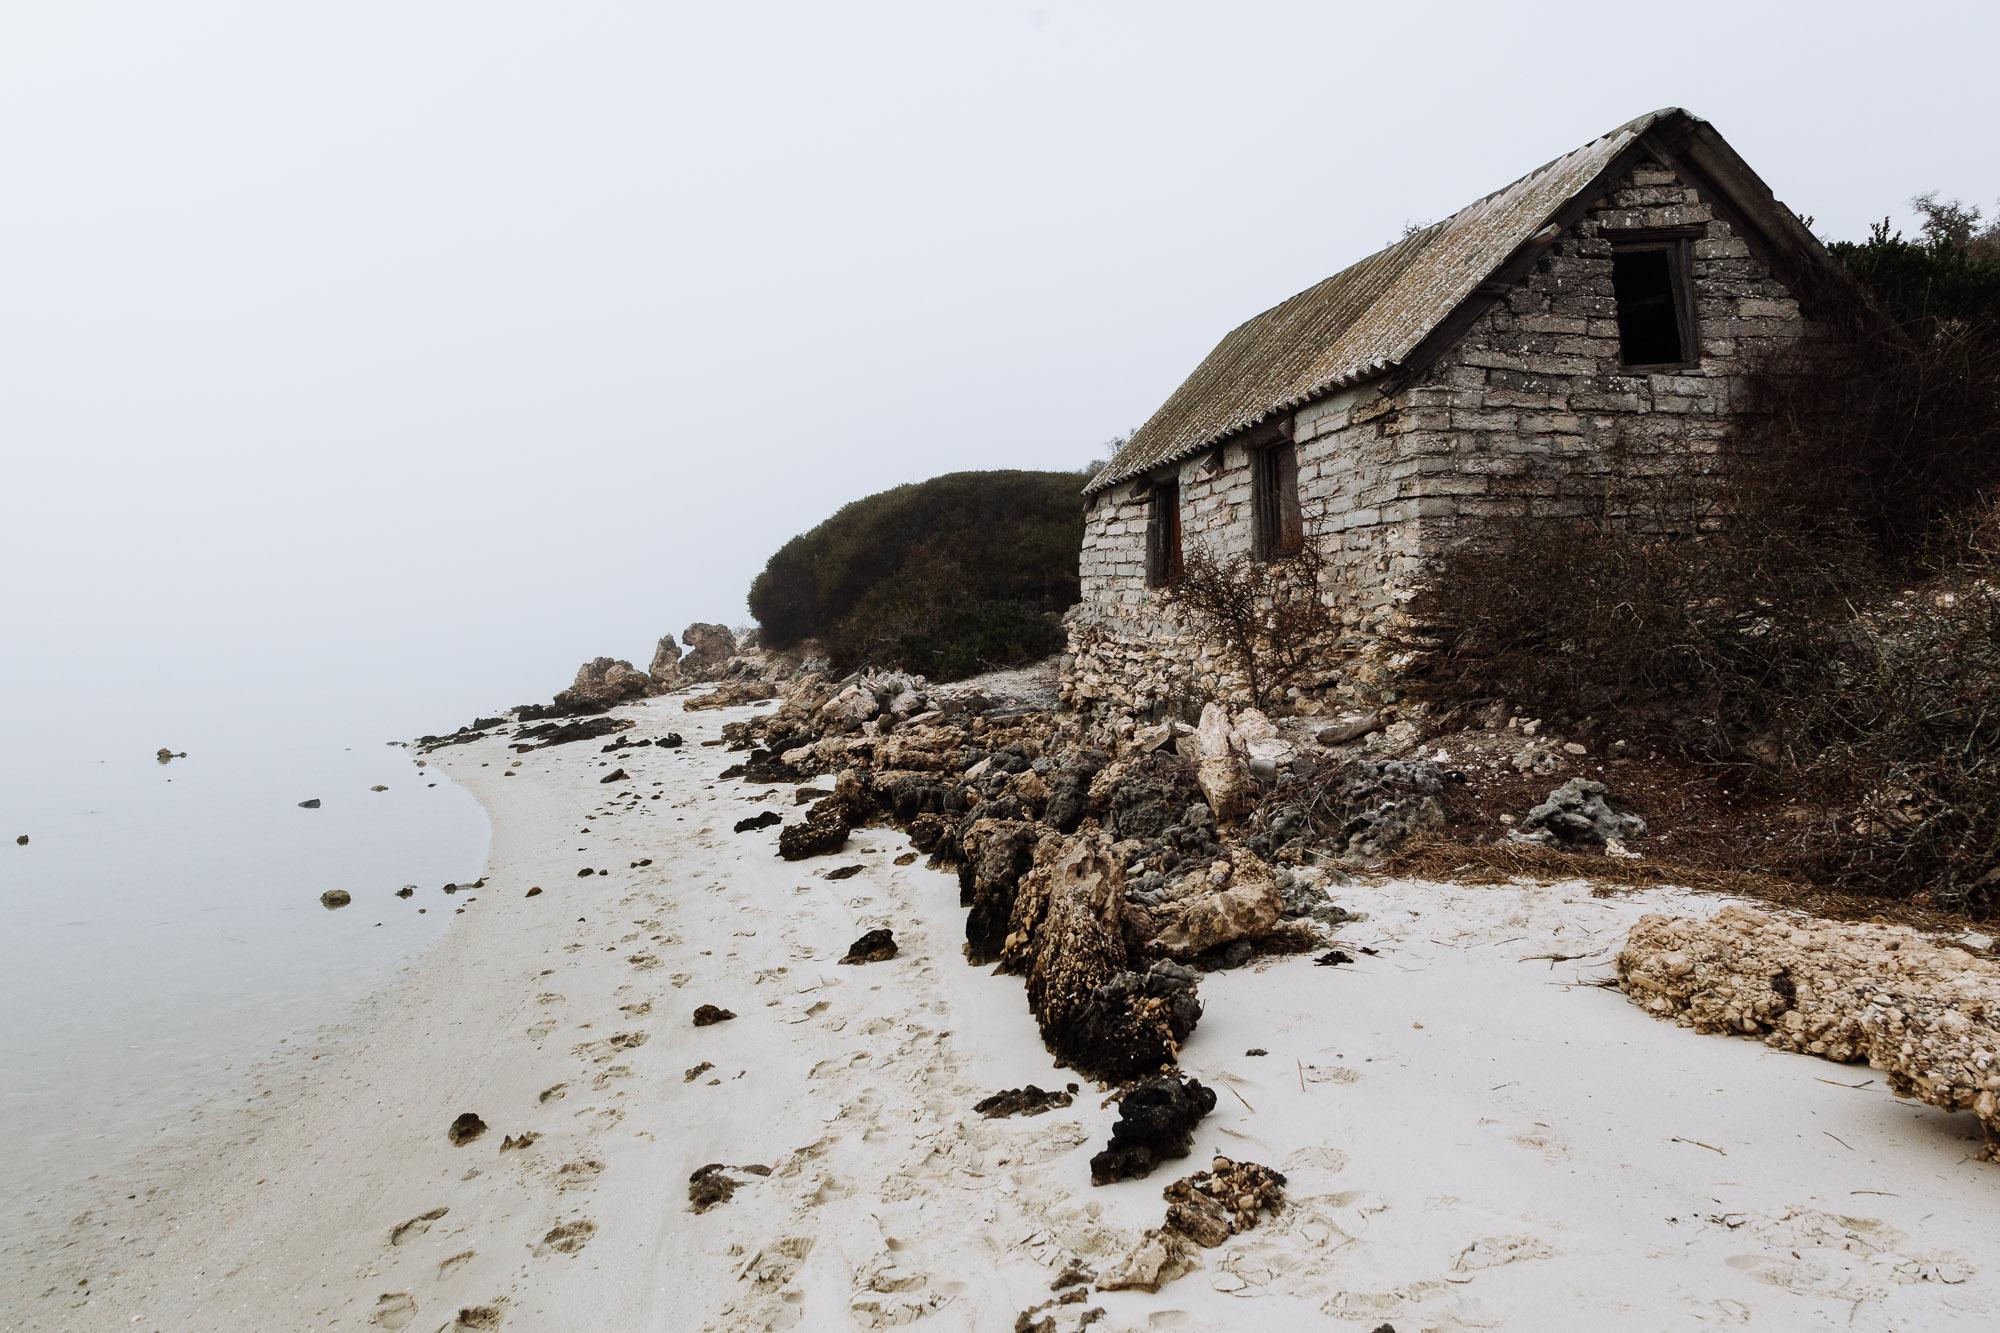 Churchhaven, South Africa